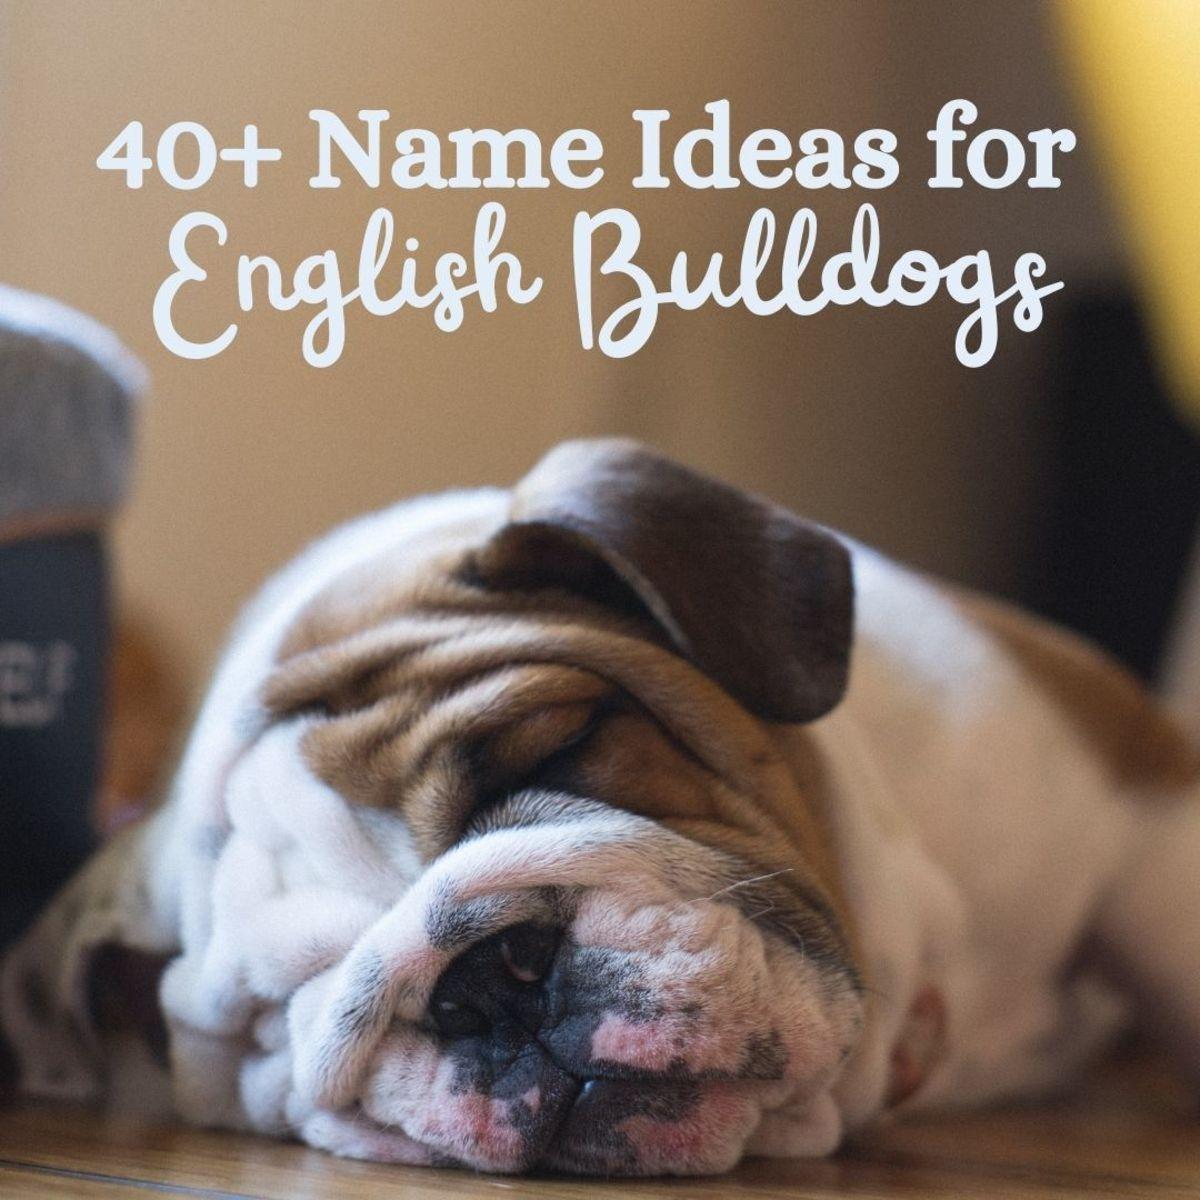 What should you name your English Bulldog?